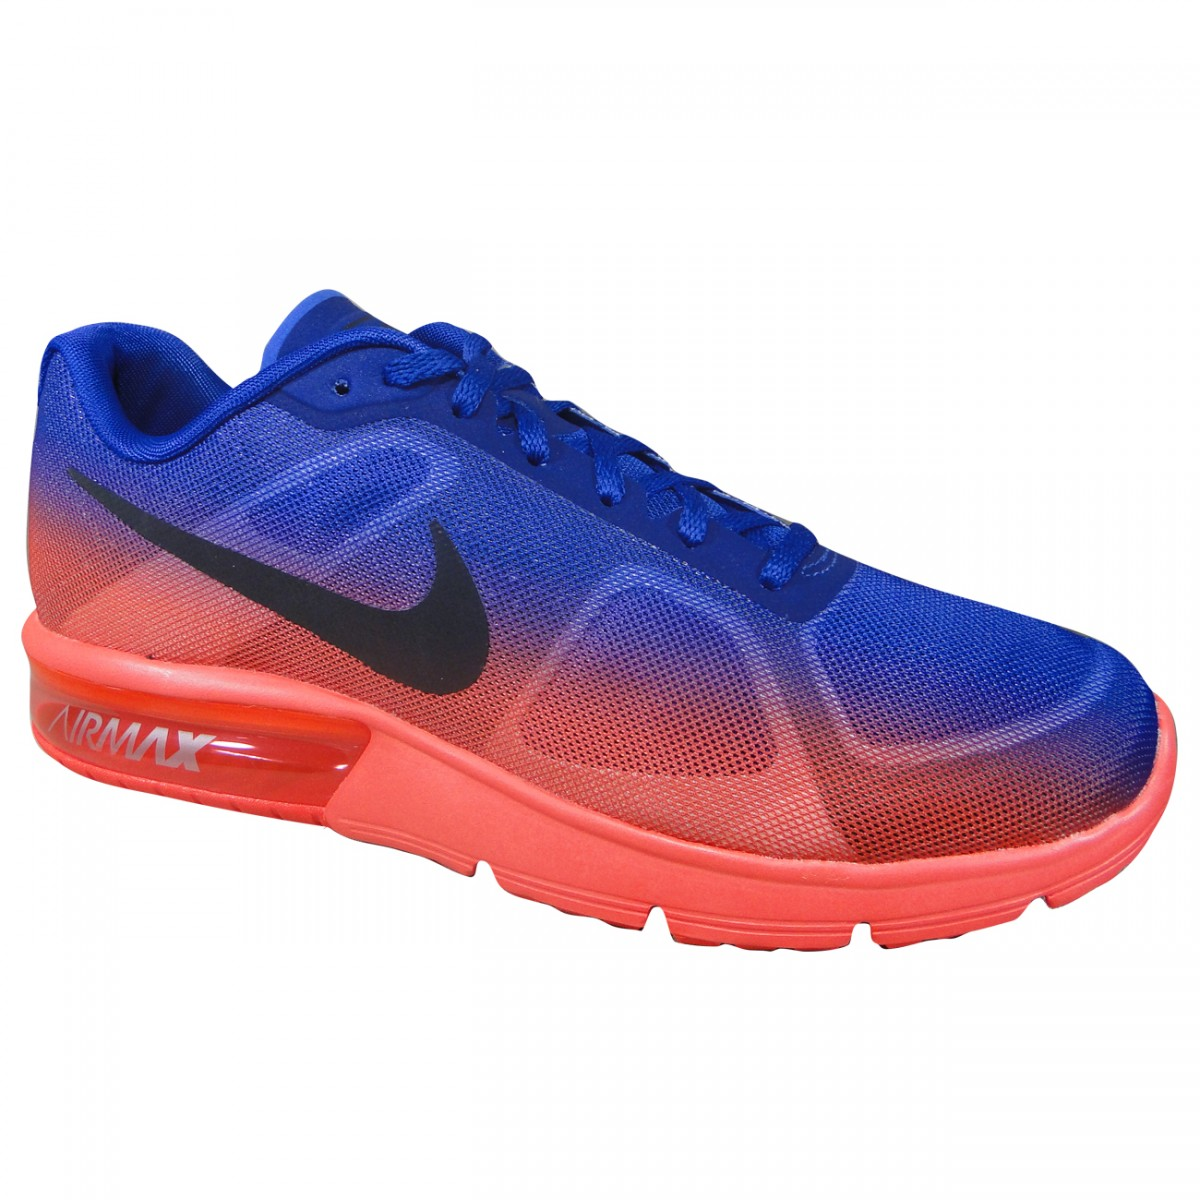 0d493c49833 Tenis Nike Air Max Sequent